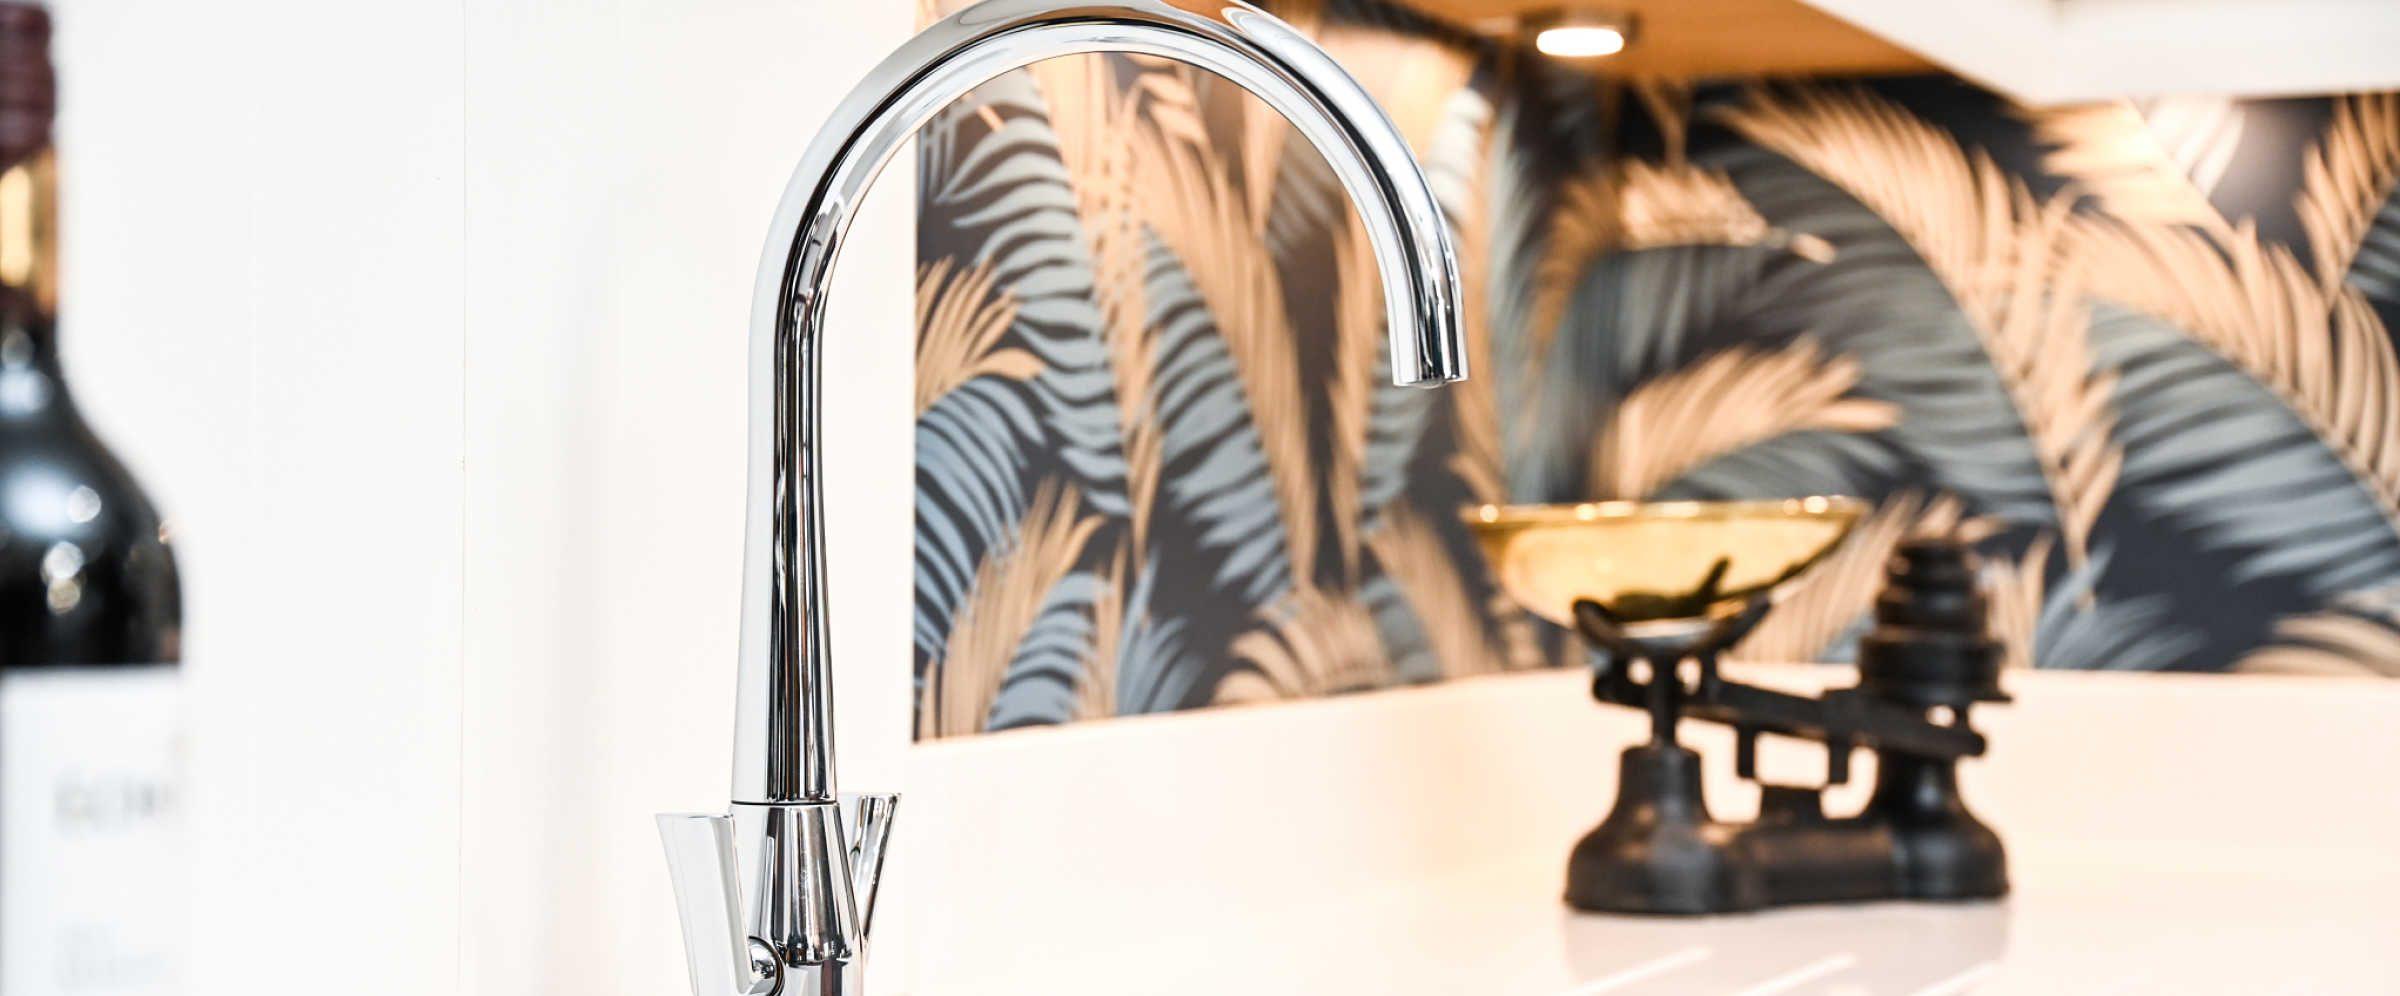 Chrome tap in kitchen showroom